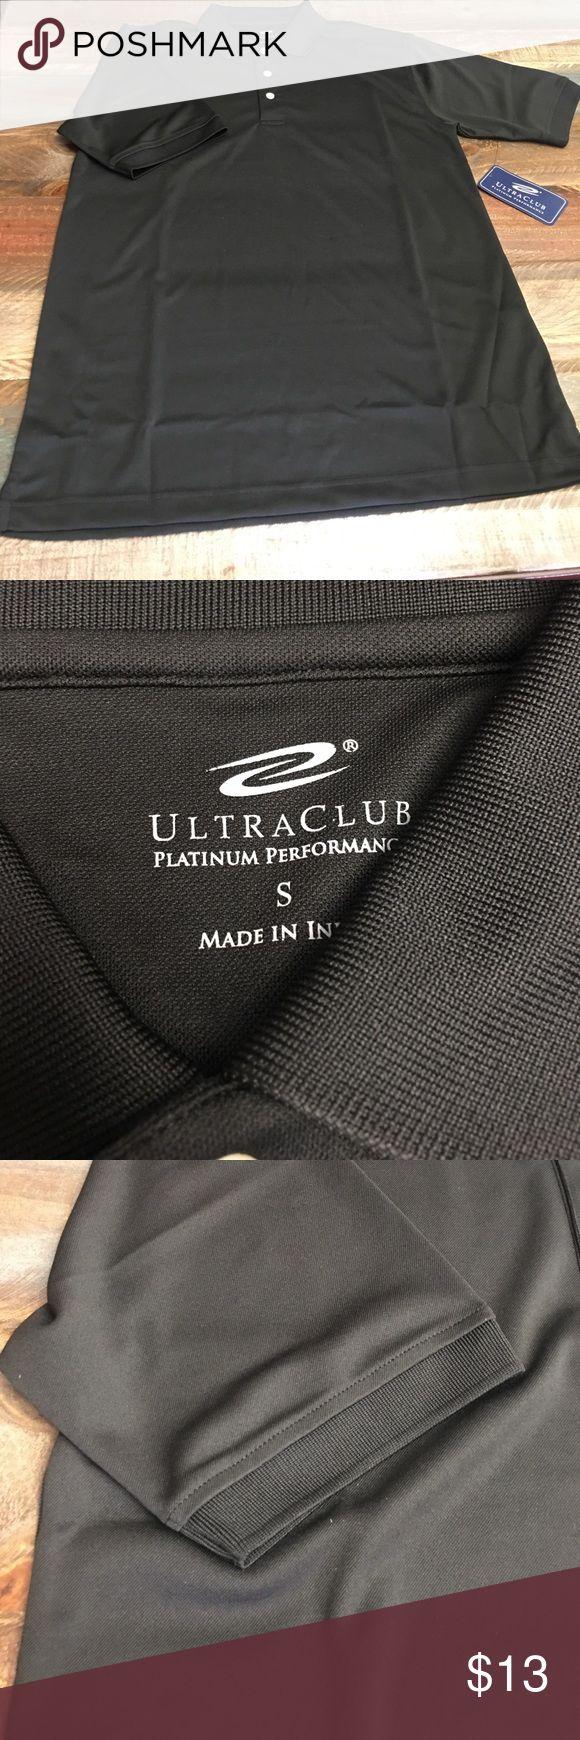 NWT men's shirt Brand new men's black shirt.. platinum performance .. Shirts